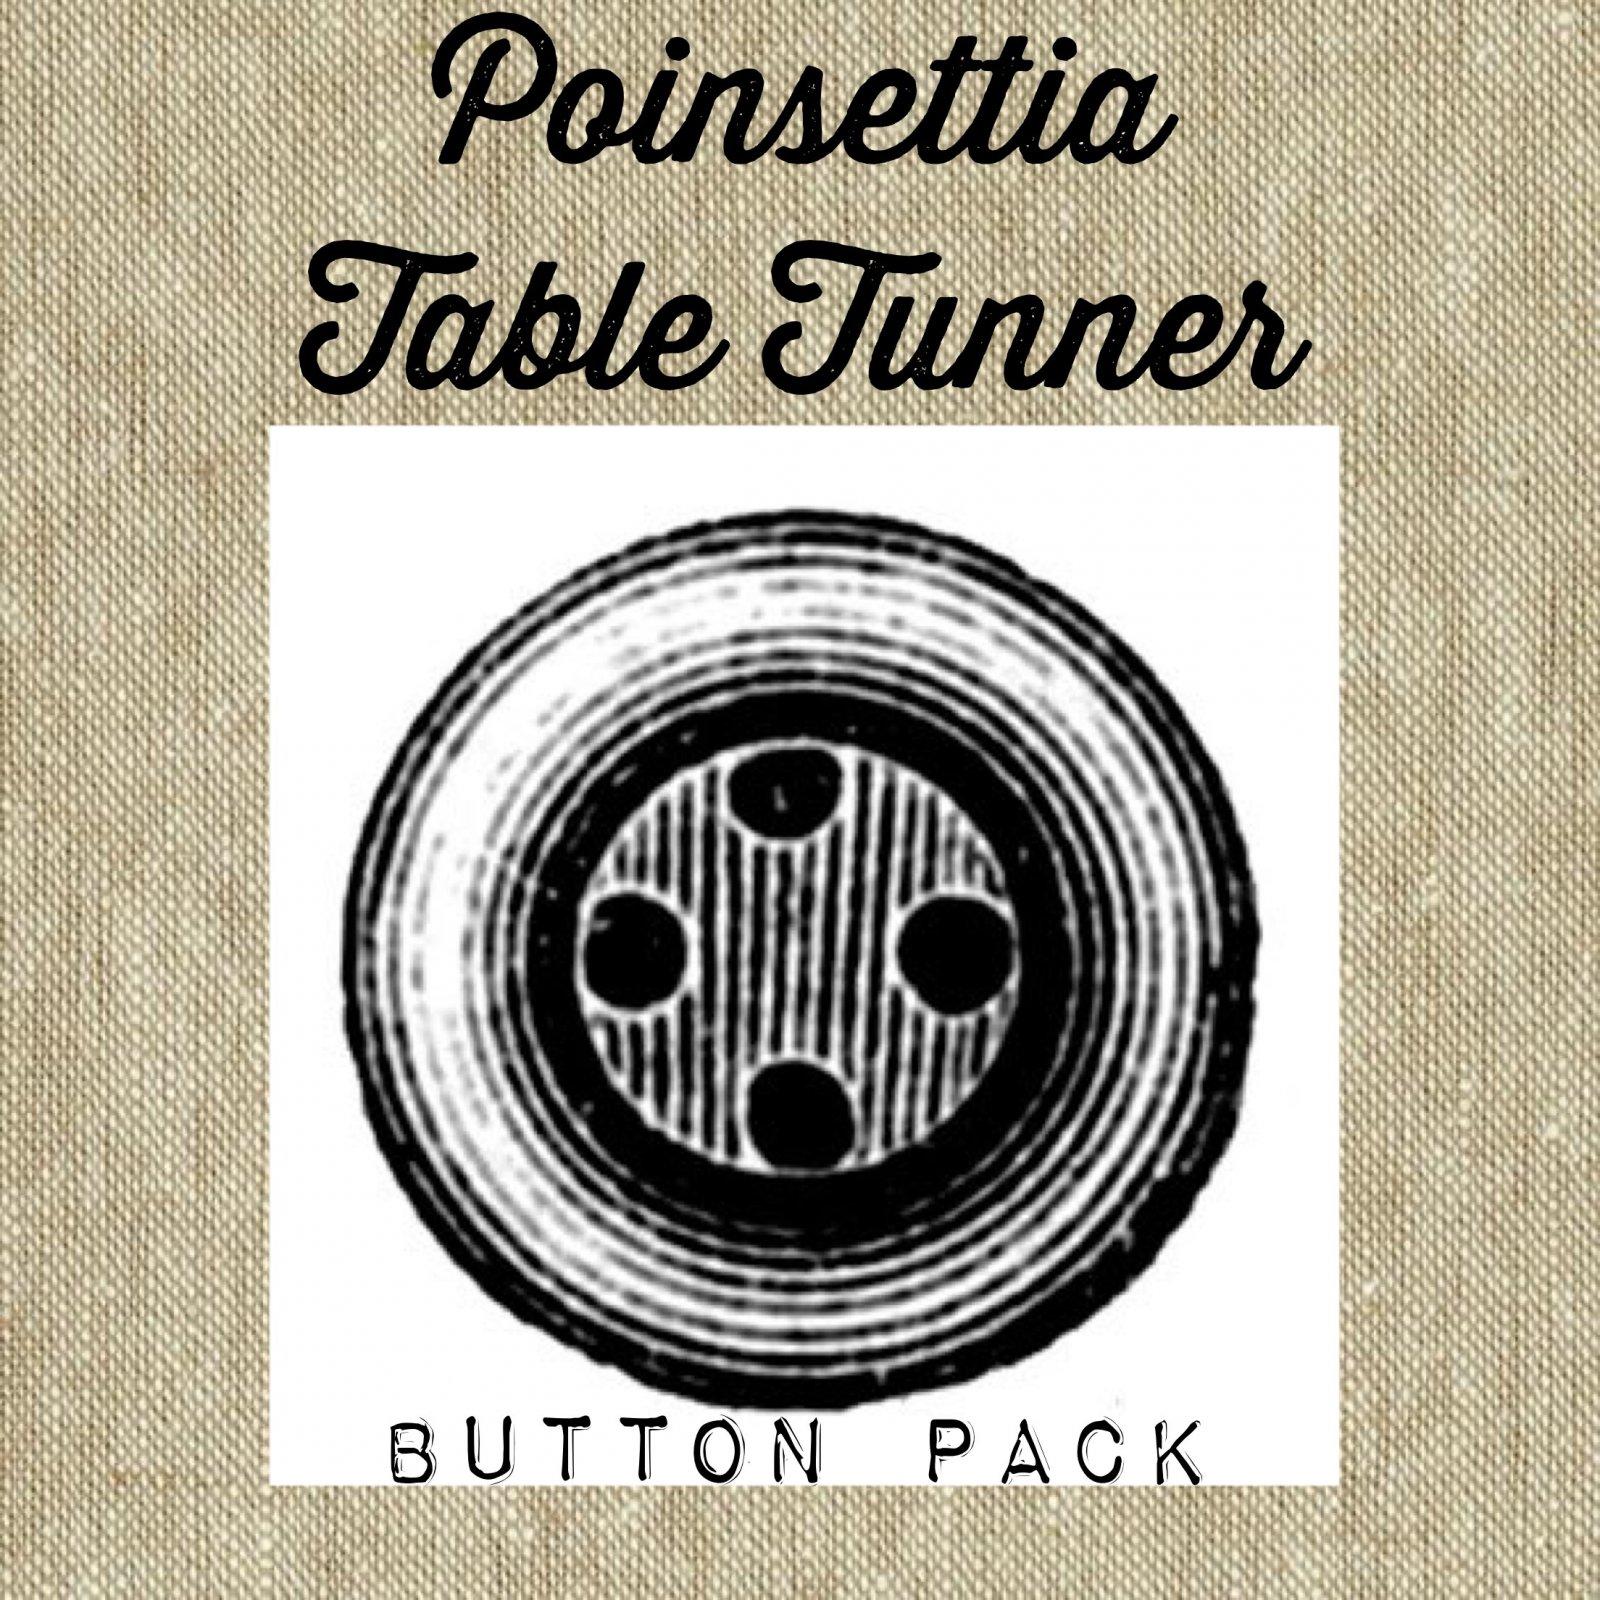 Poinsettia Table Runner Button Pack